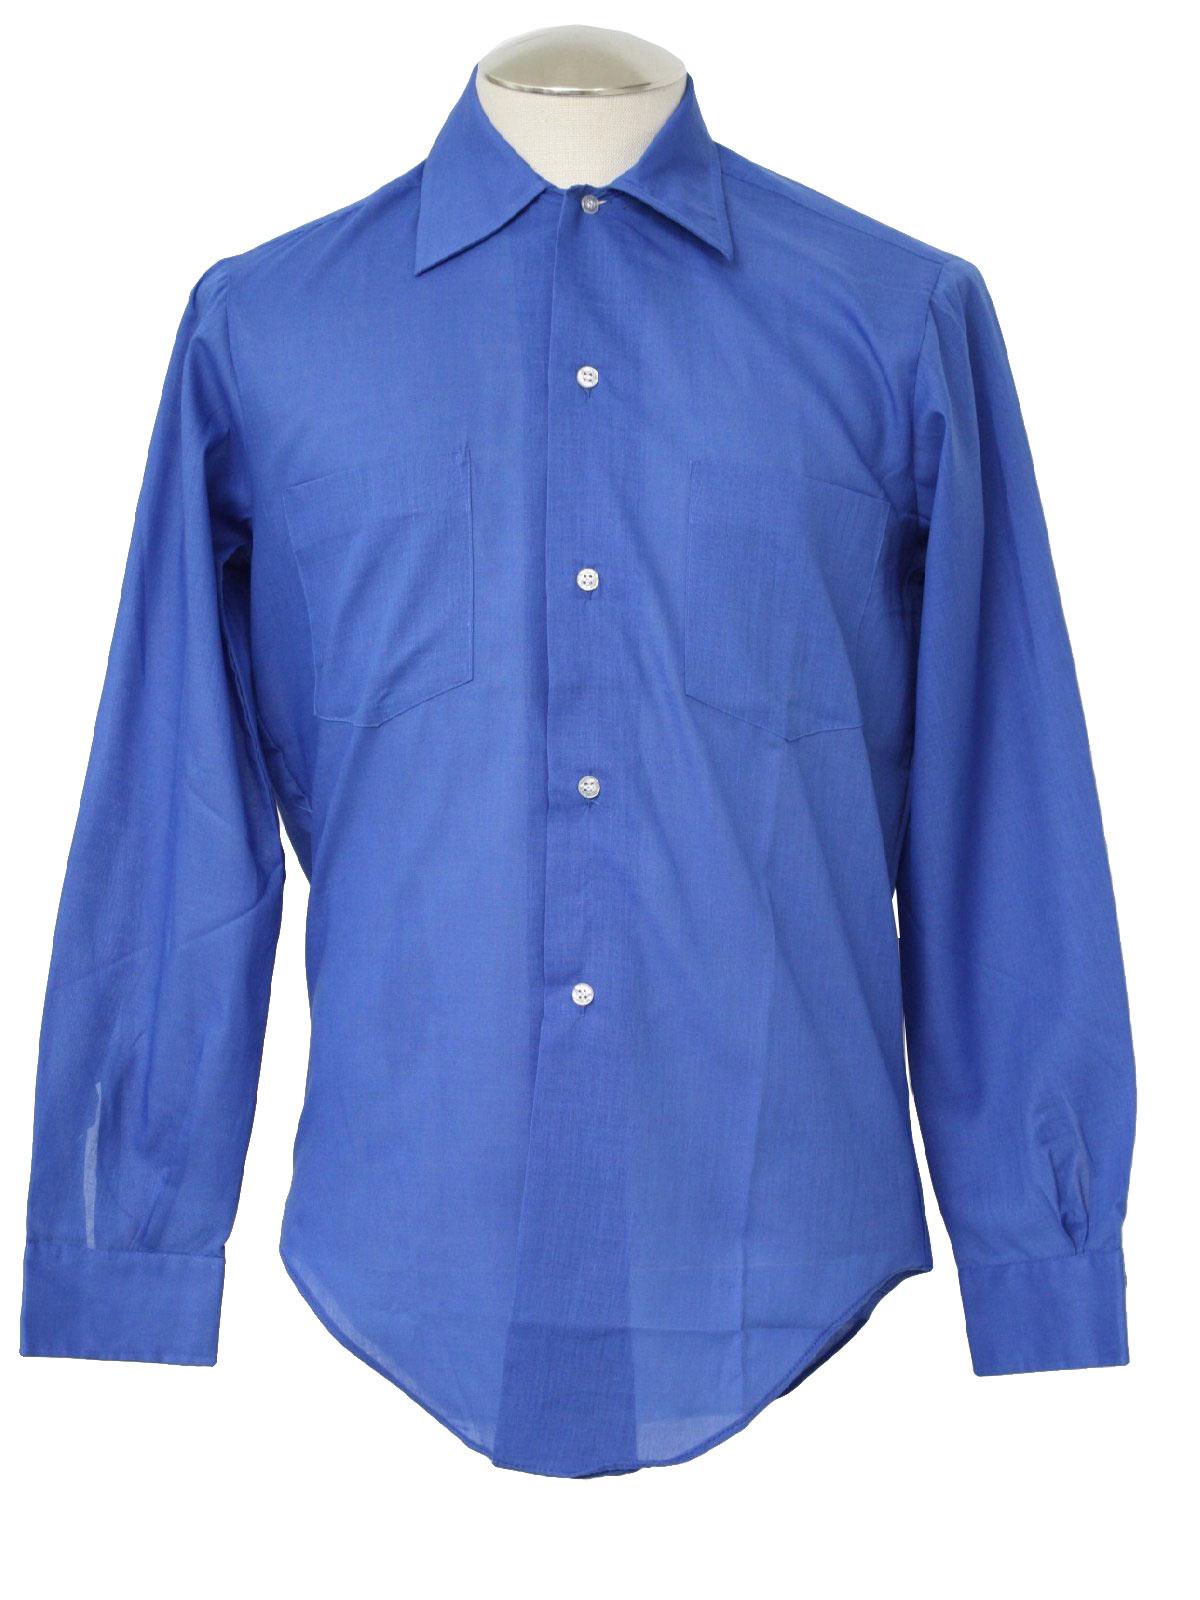 60 39 S Bud Berma Shirt 60s Bud Berma Mens New Old Light